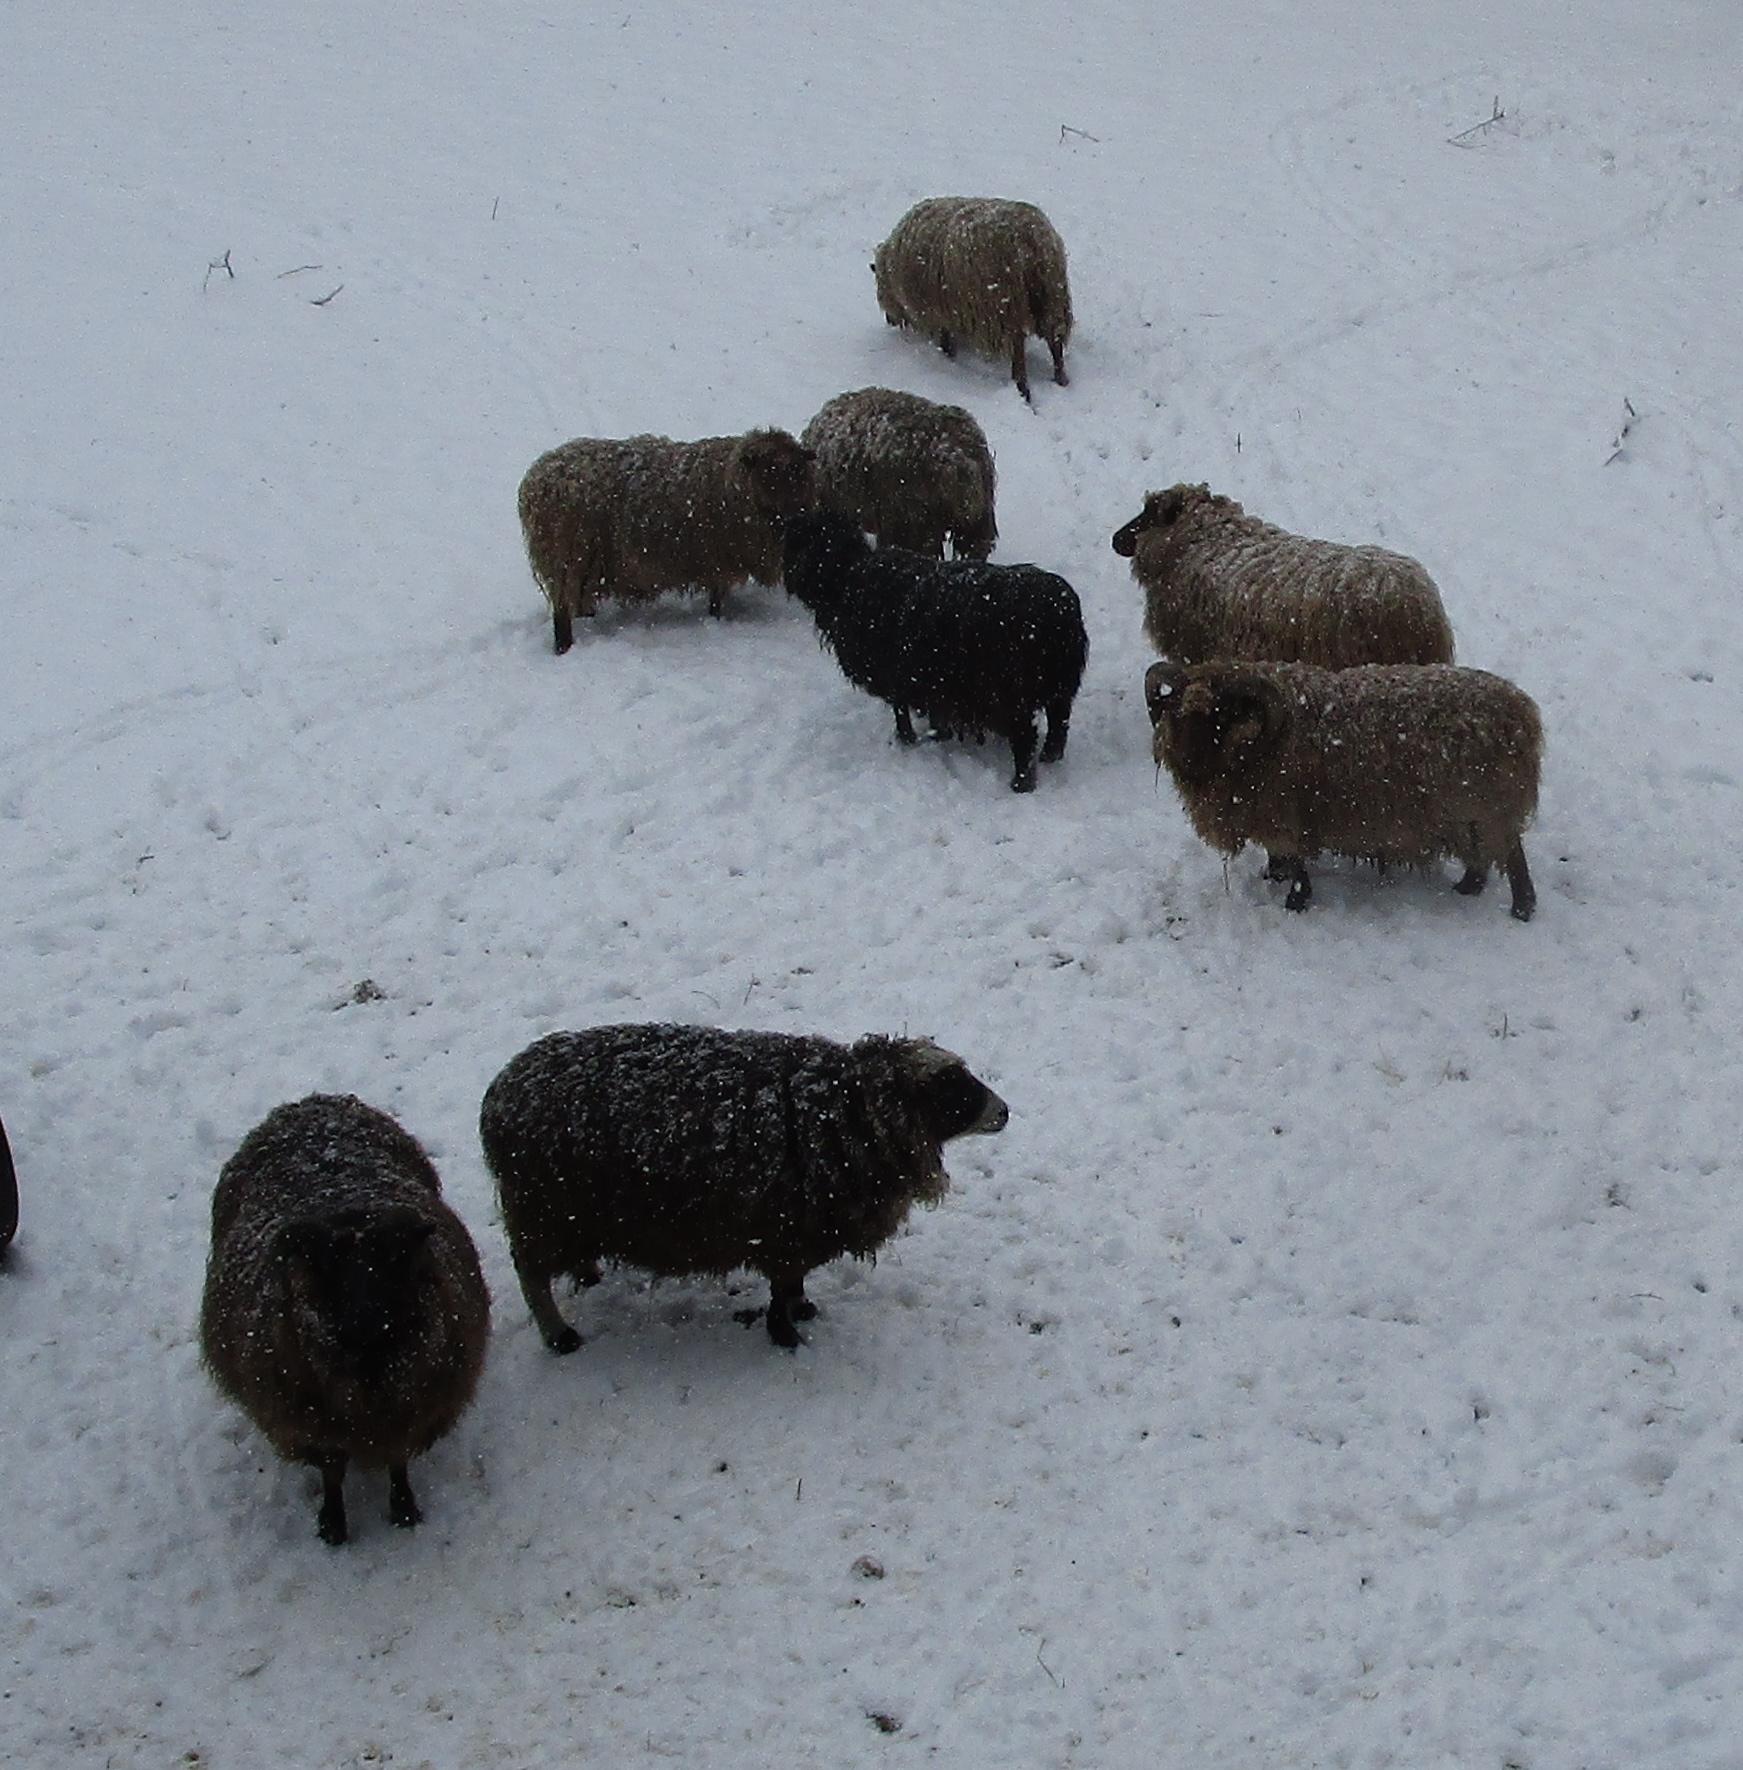 snowy sheep from hay loft